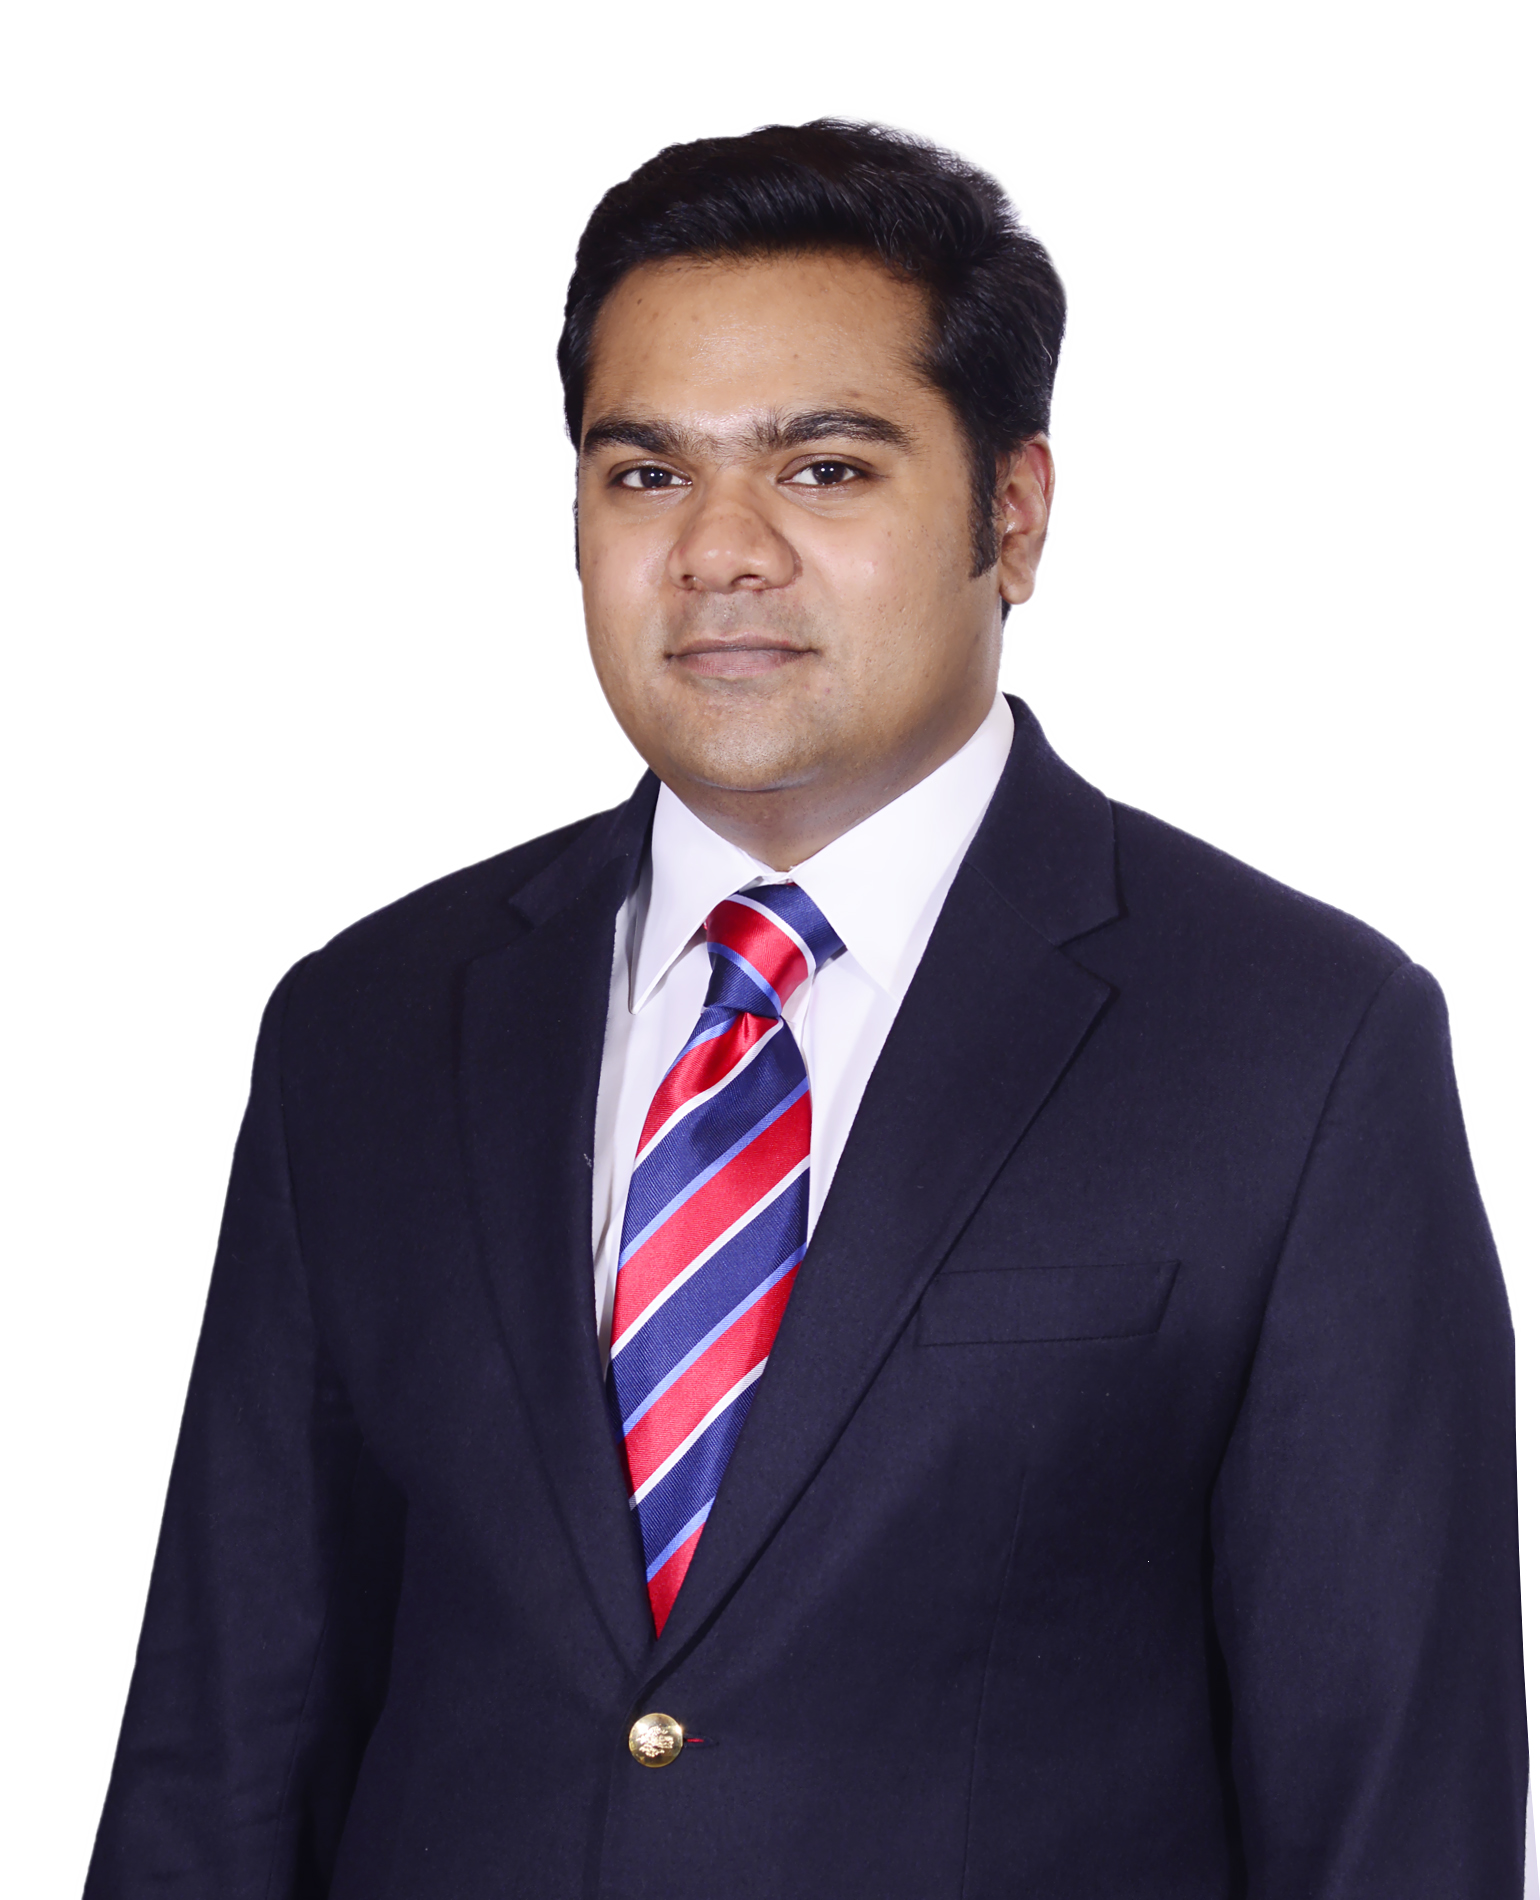 Abhijeet Shrivastava